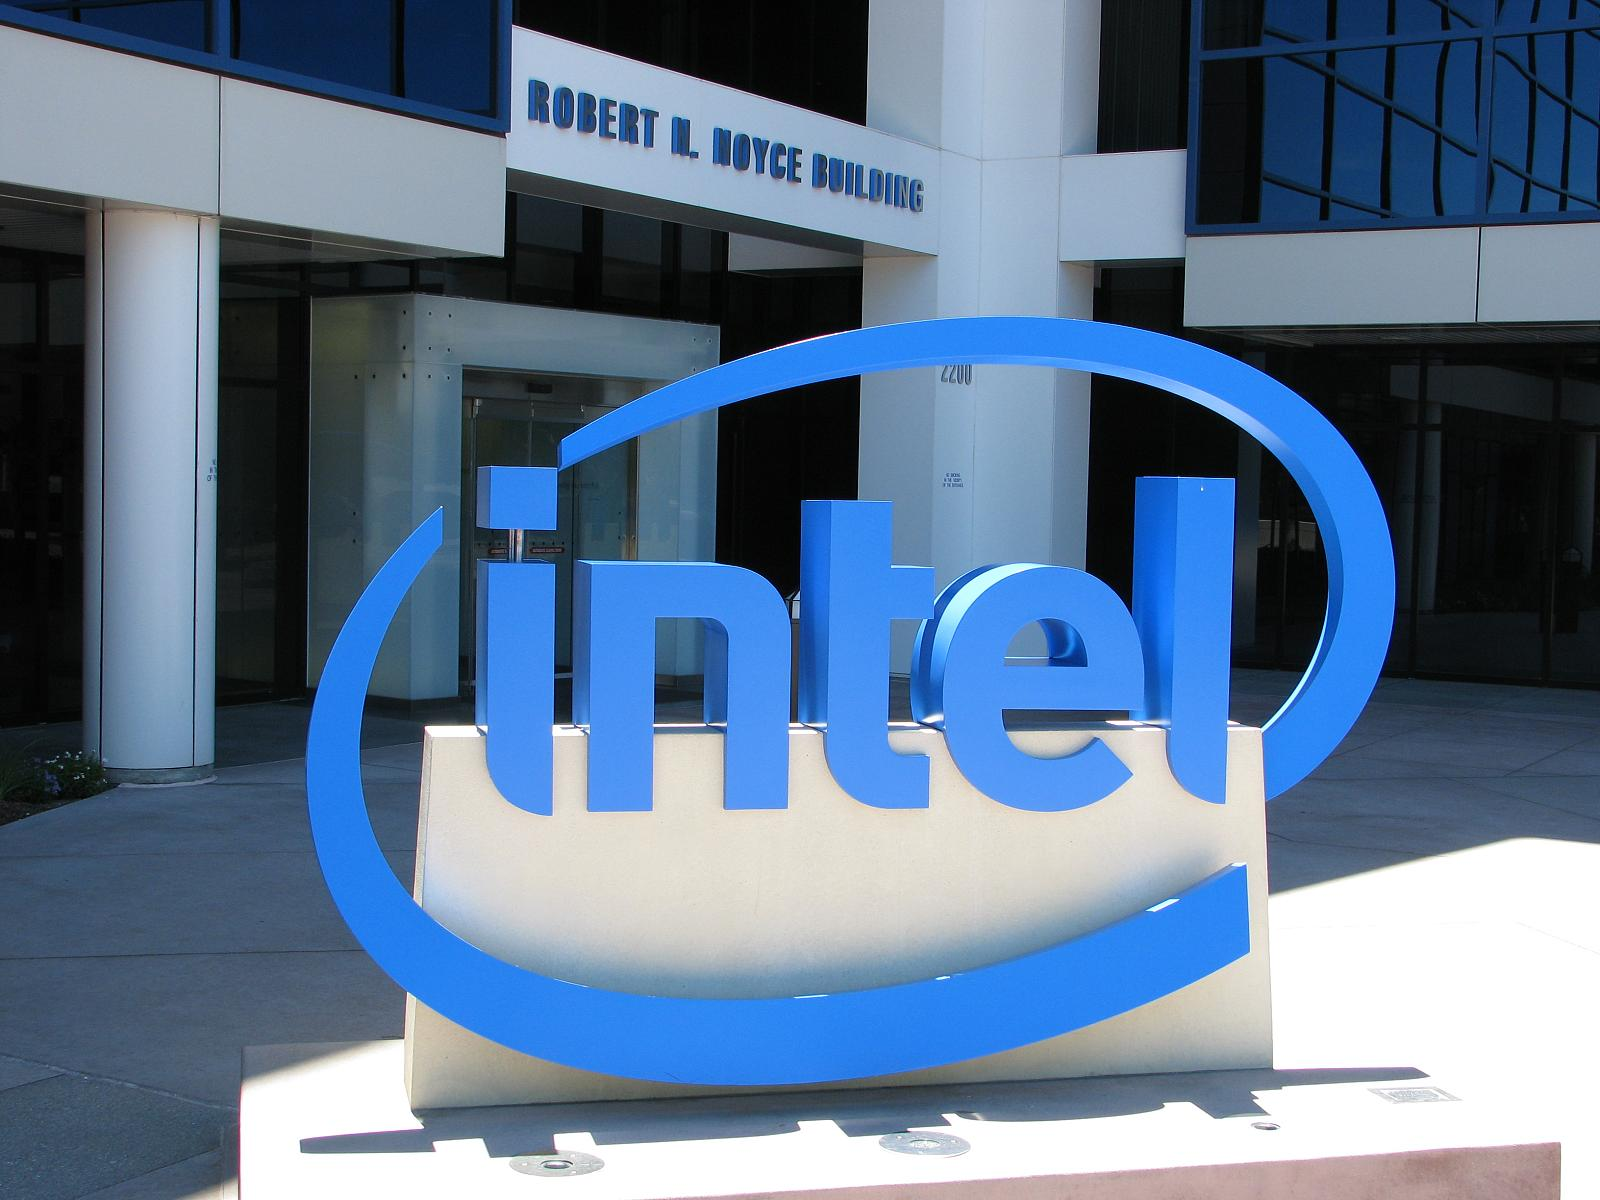 Цифра дня: Сколько сотрудников увольняет Intel из-за спада на рынке ПК?